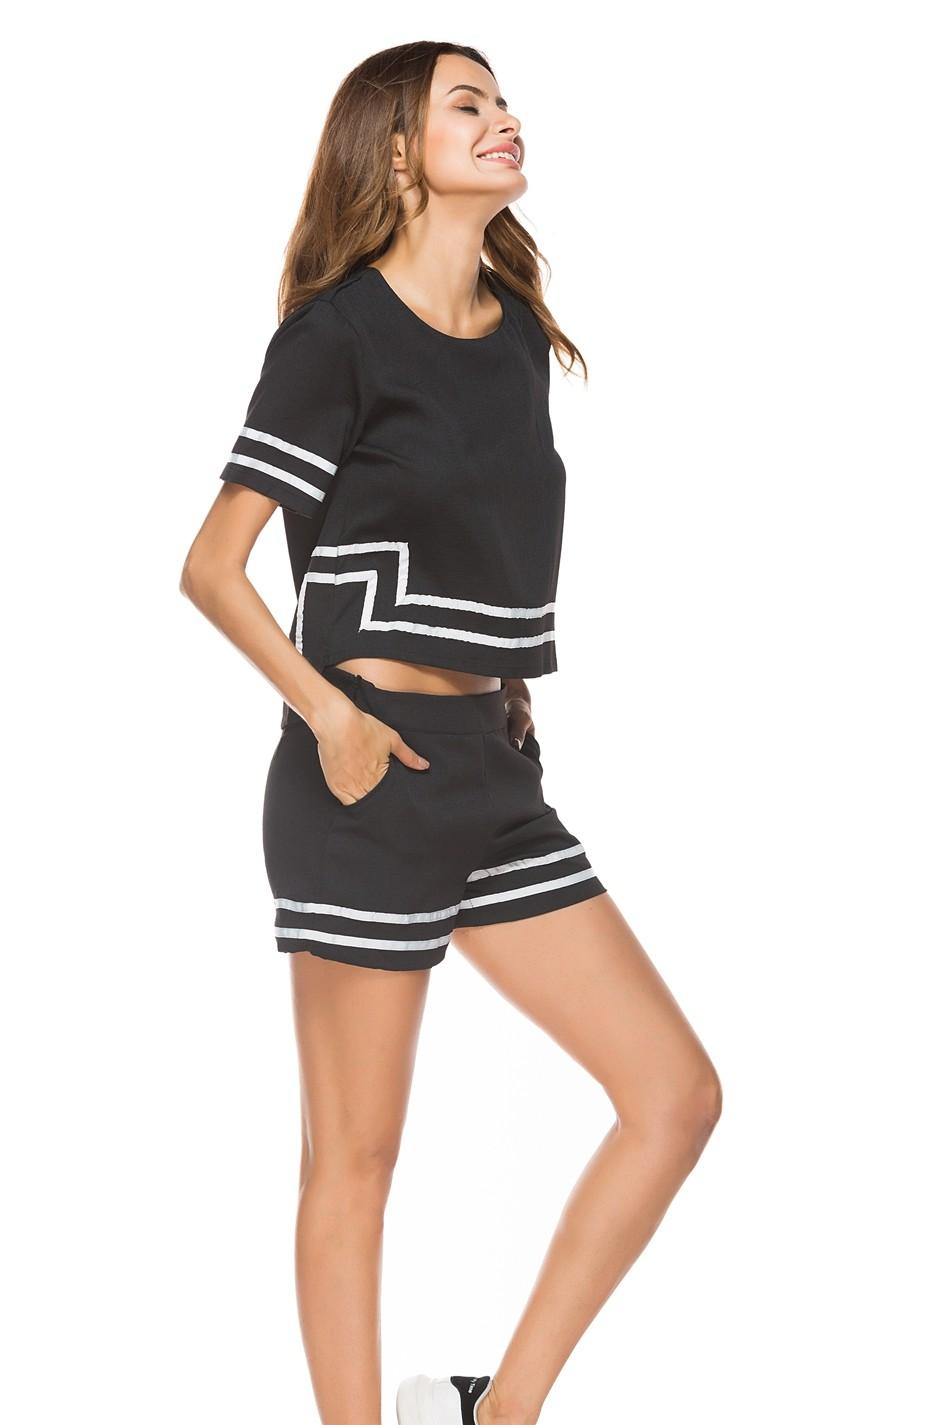 GSS8525XX Top+Shorts